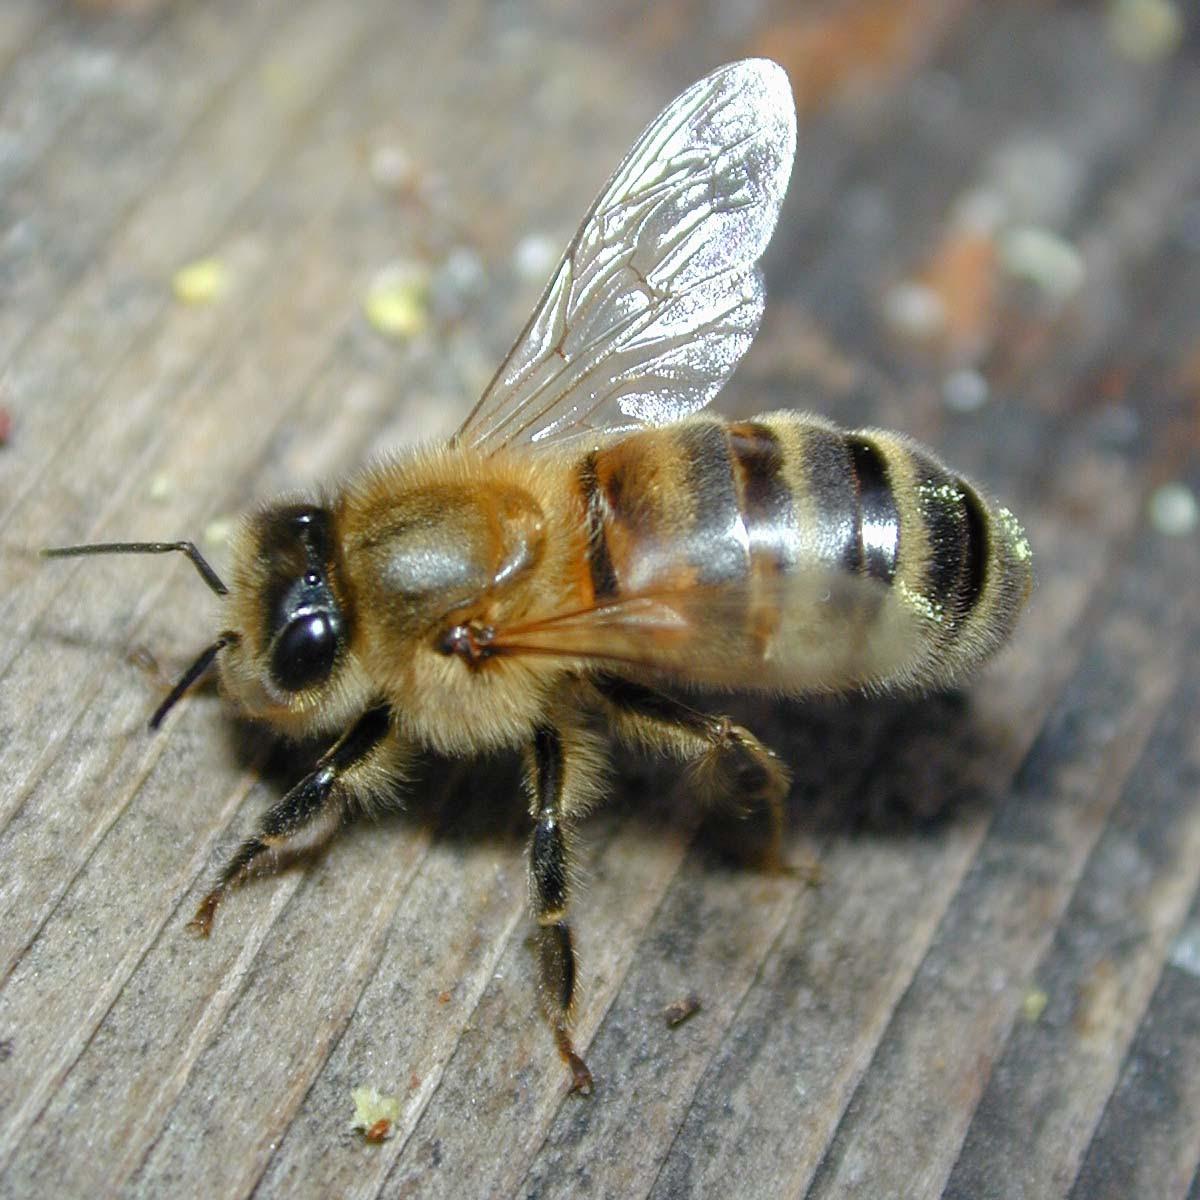 http://www.wmconnolley.org.uk/bees/DSCN6624-bee-close_1200x1200.JPG